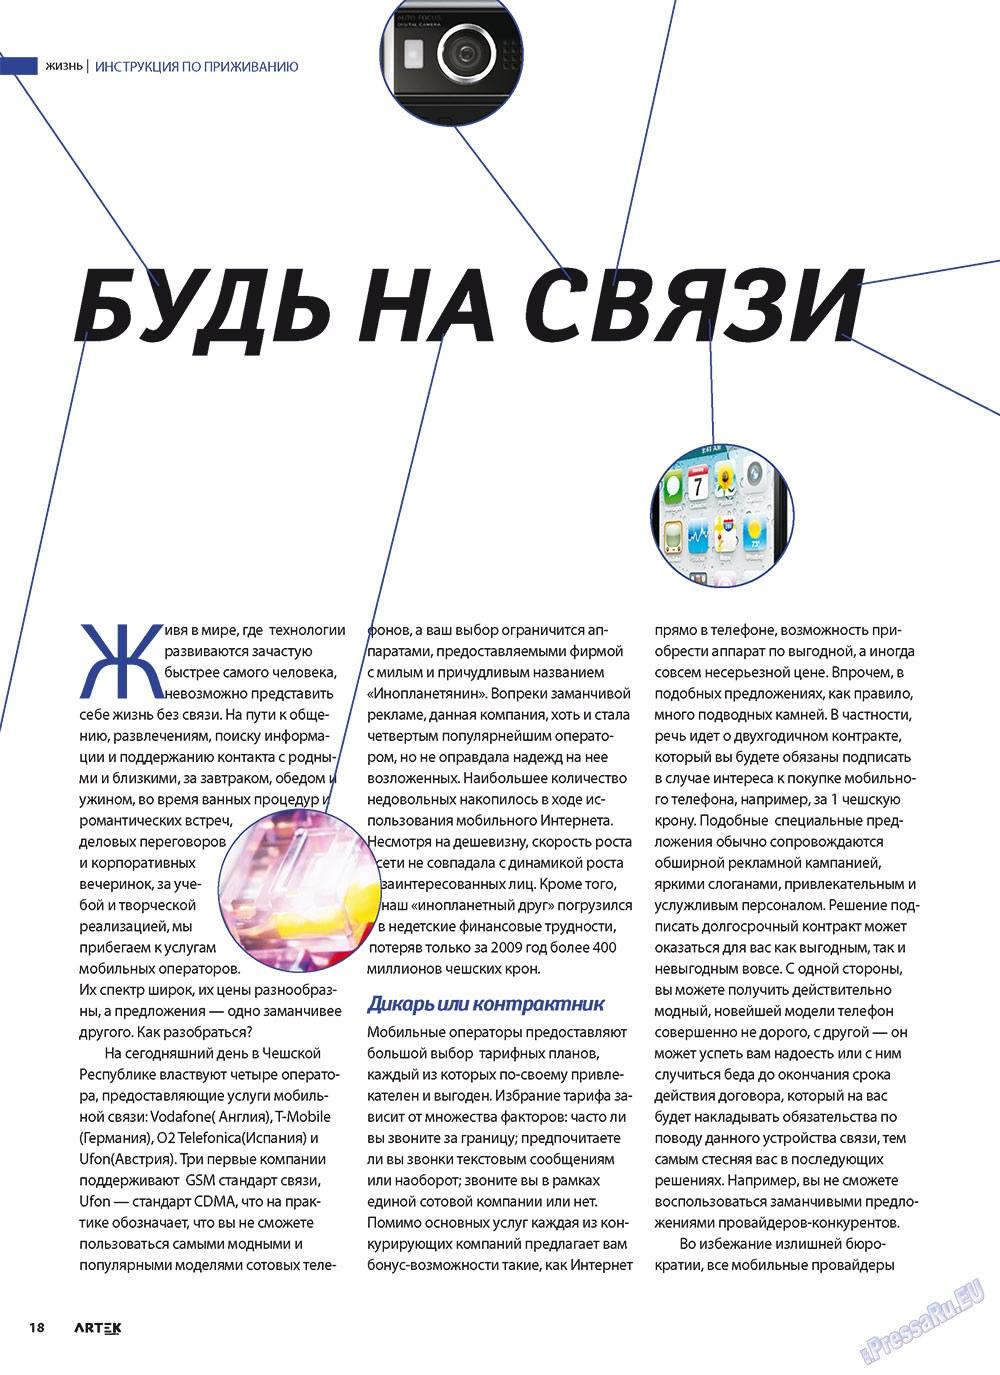 Артек (журнал). 2011 год, номер 1, стр. 20